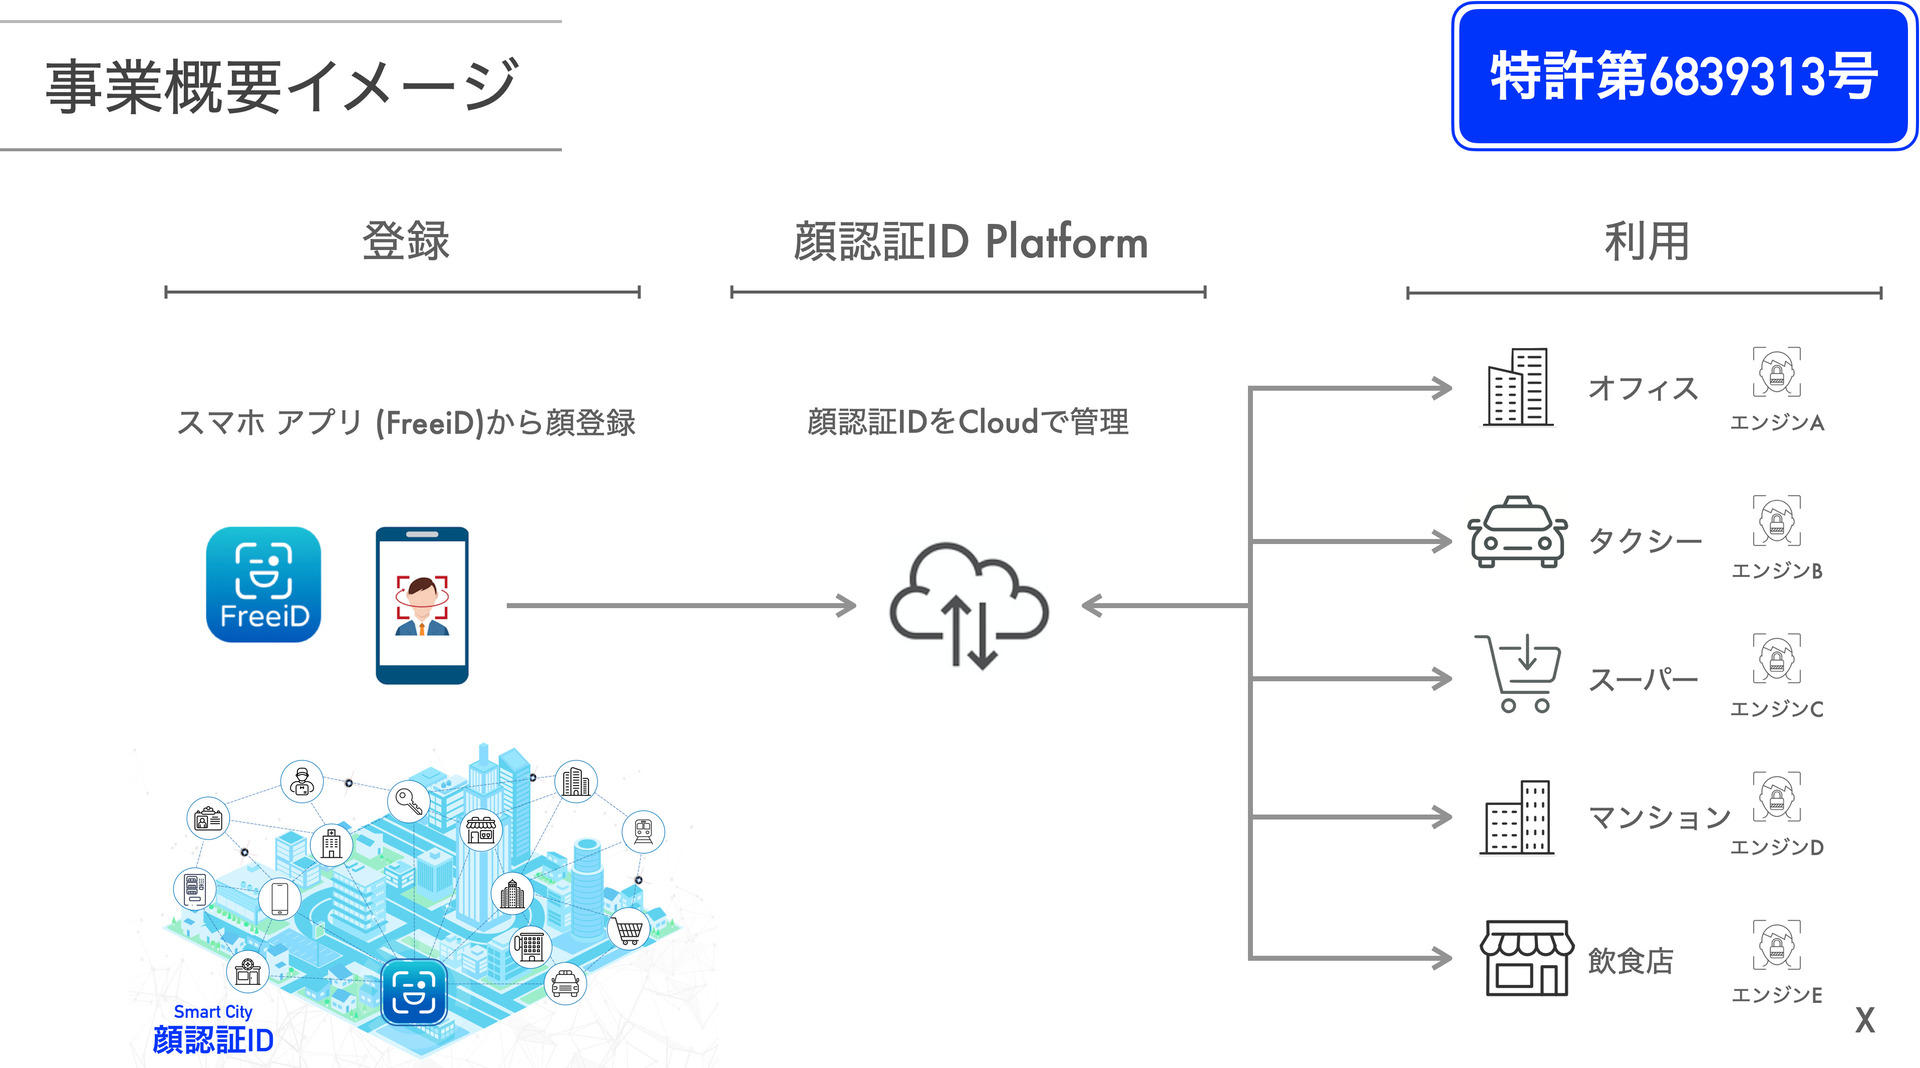 DXYZ、顔認証システムで特許取得